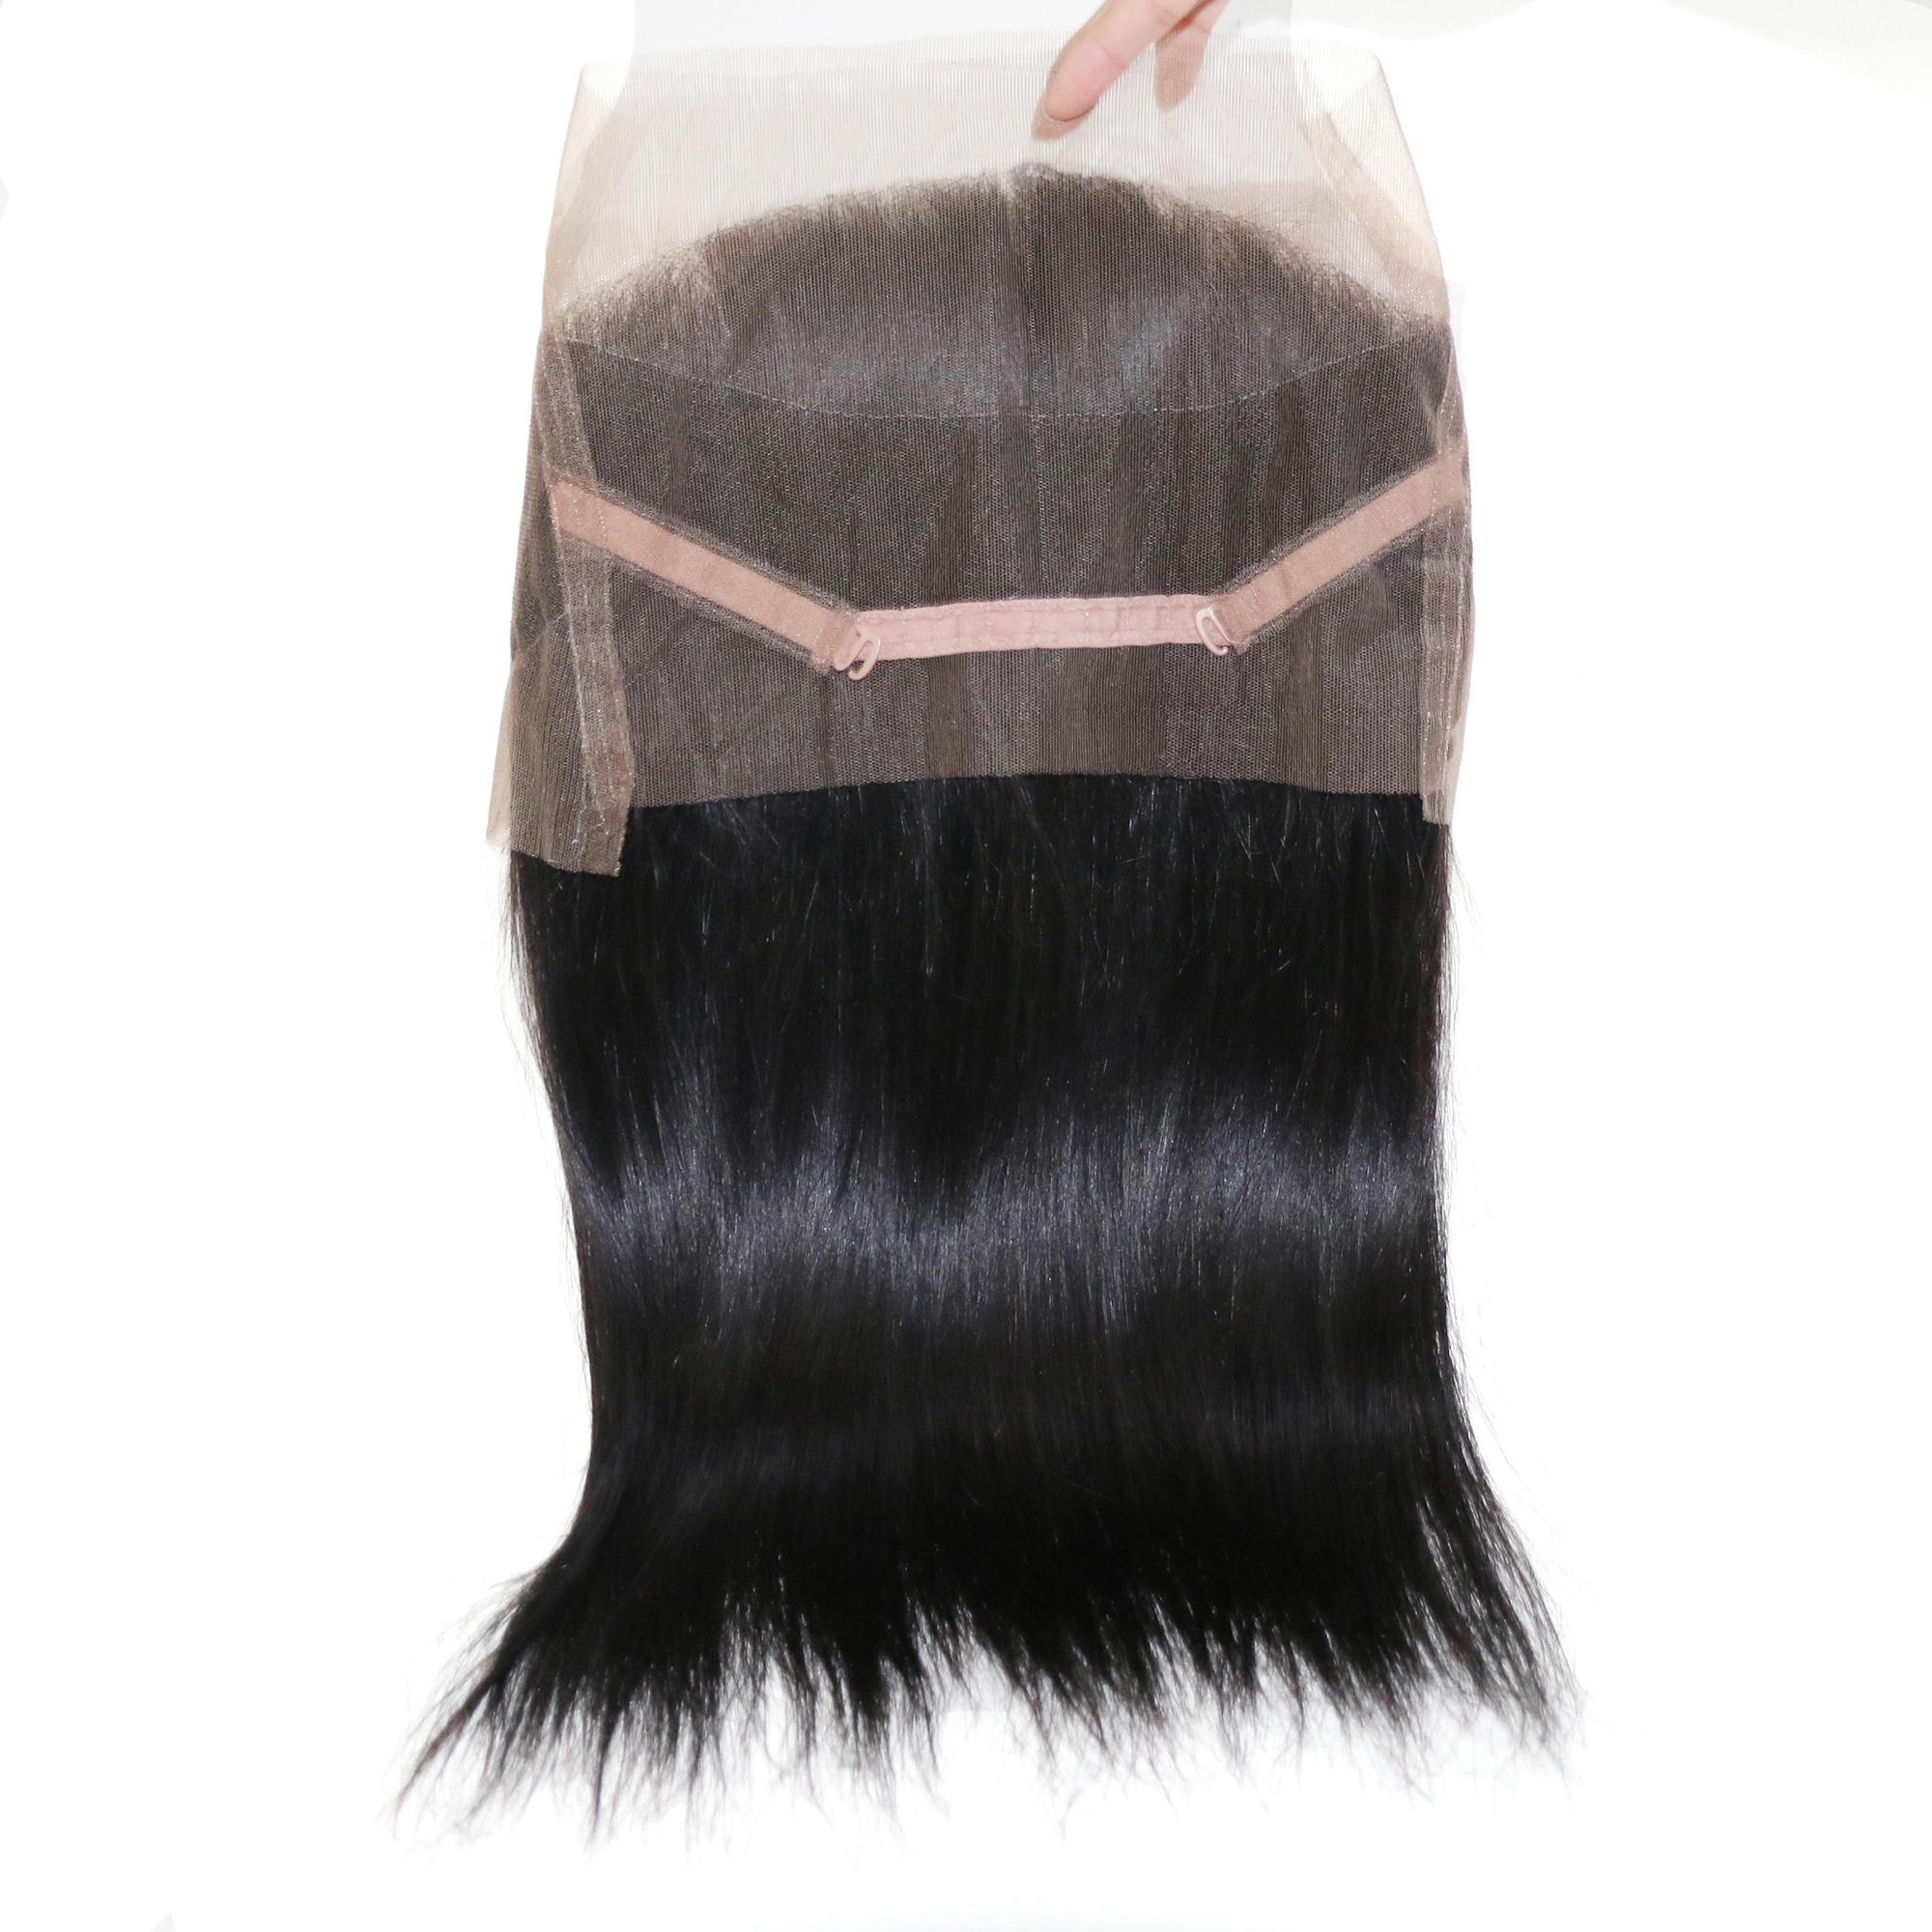 UNice Hair image 23